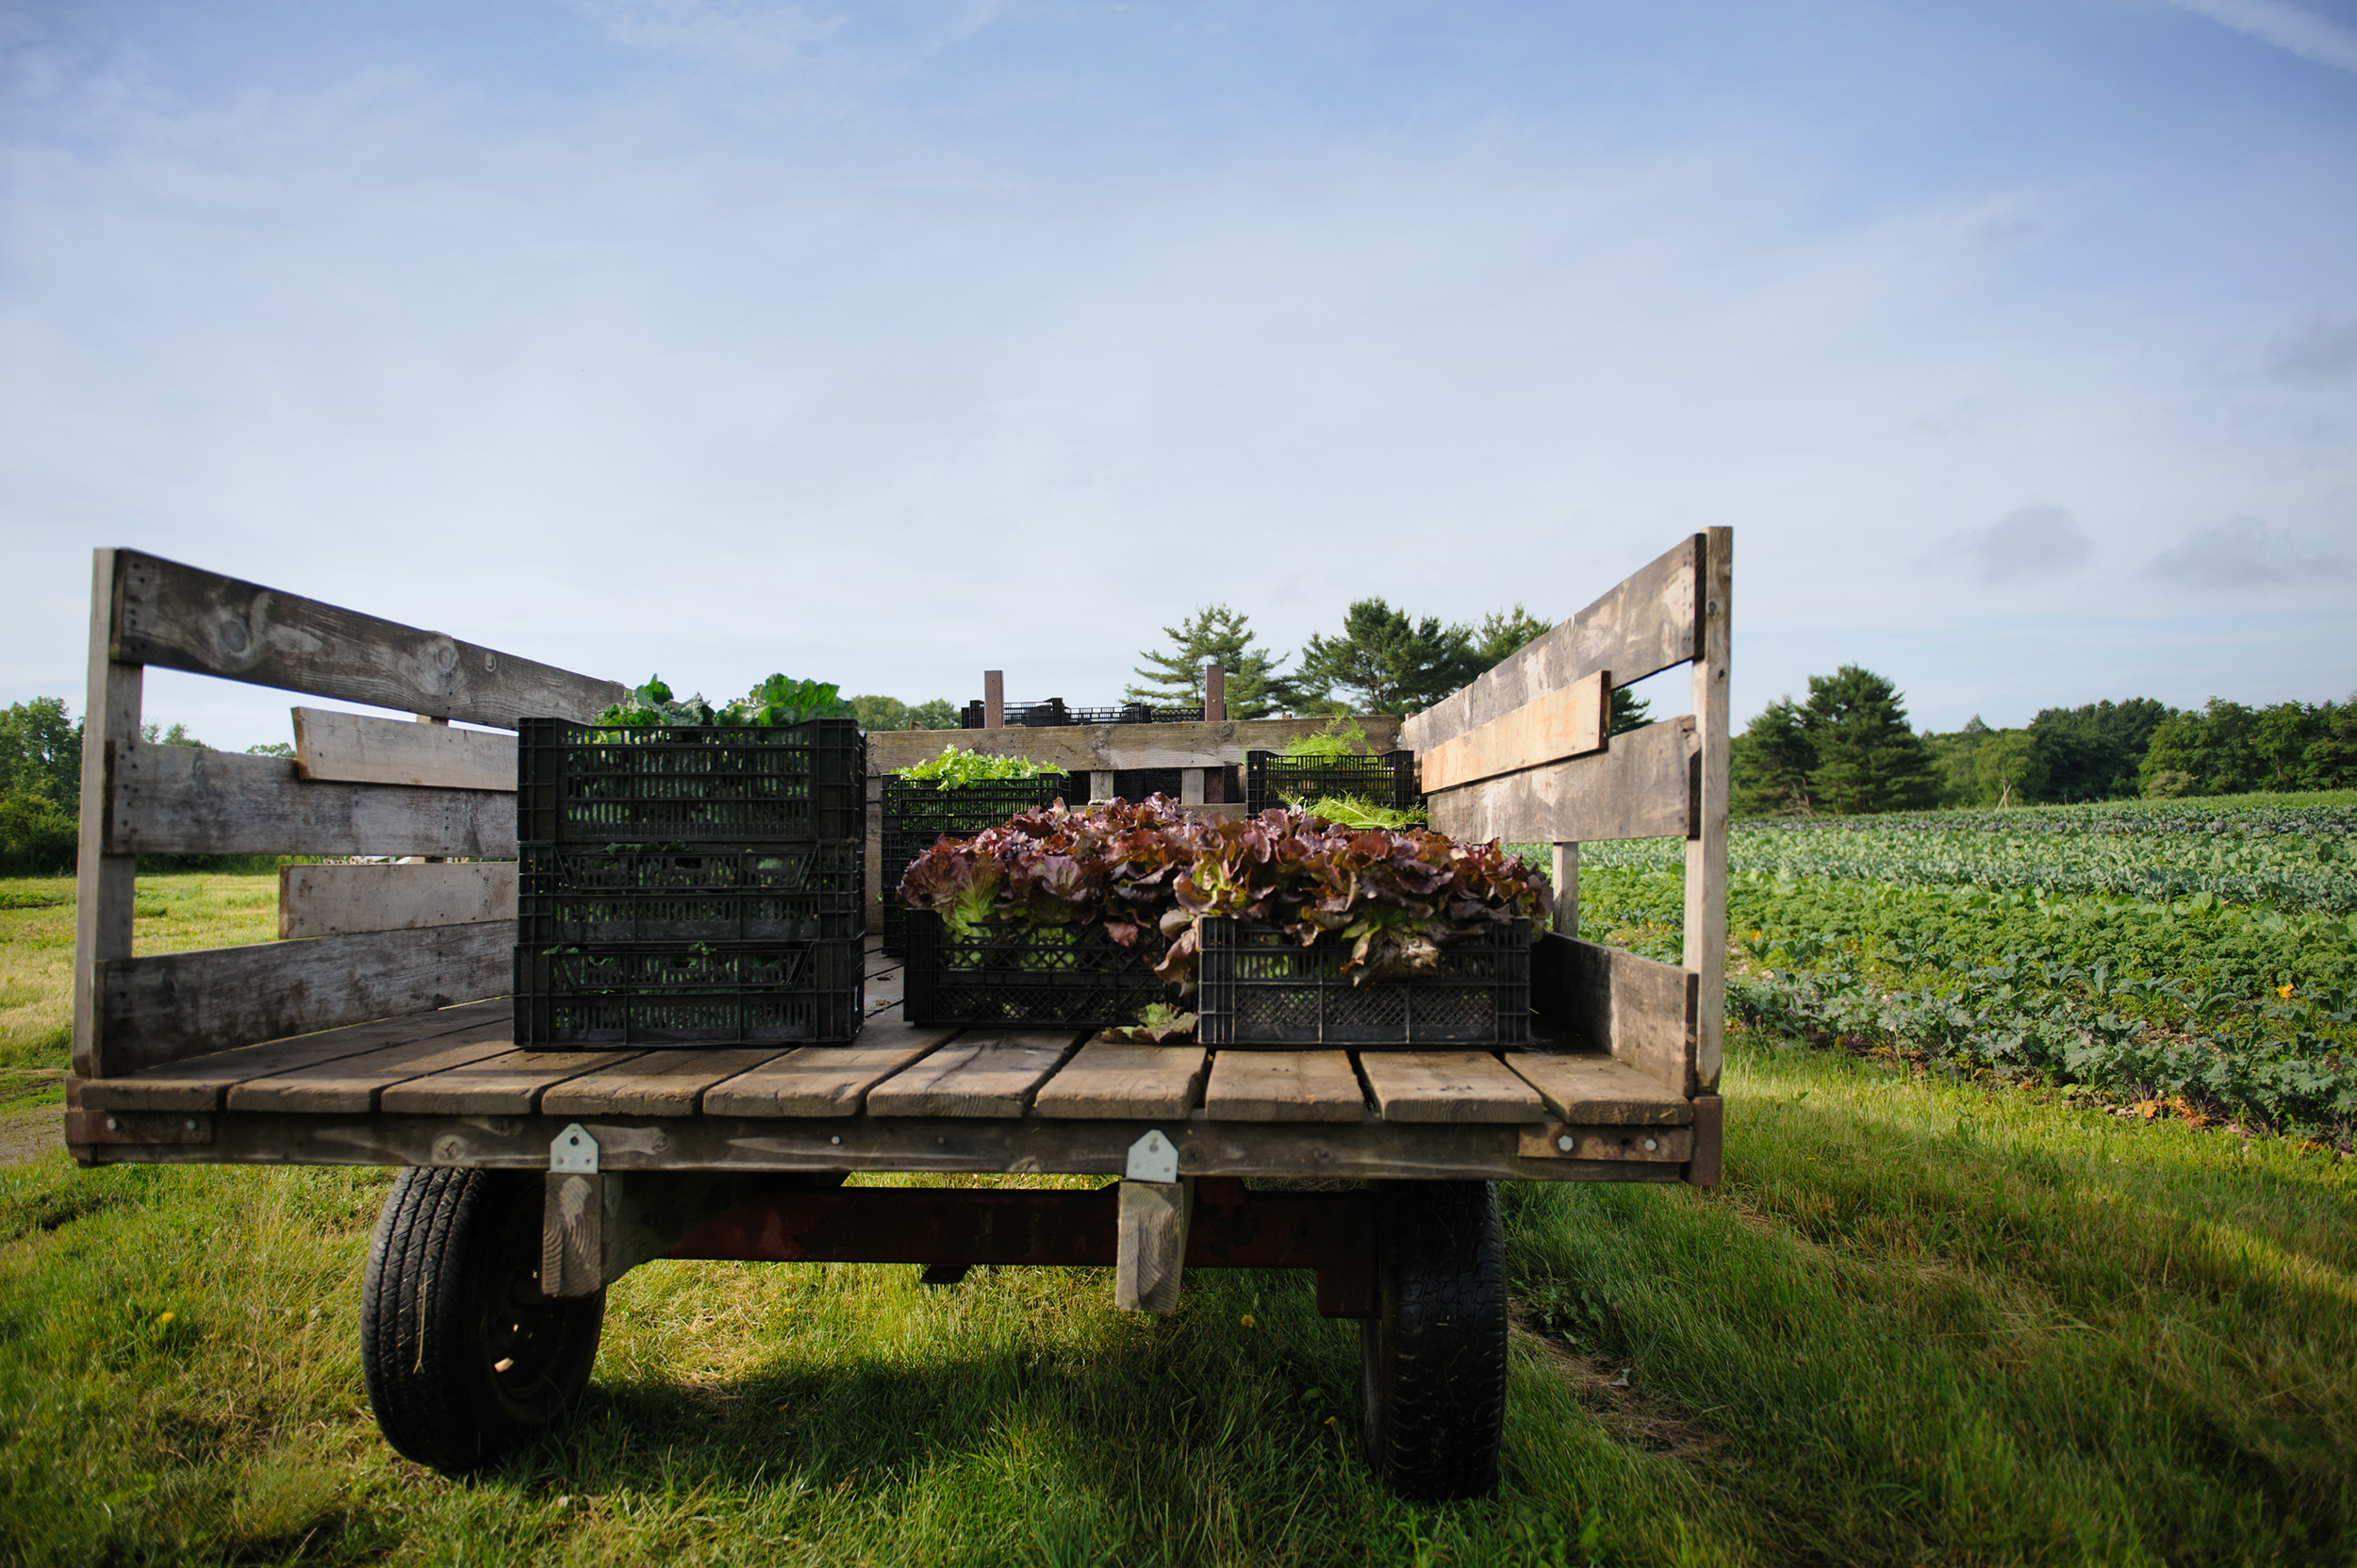 truck on farm.jpg